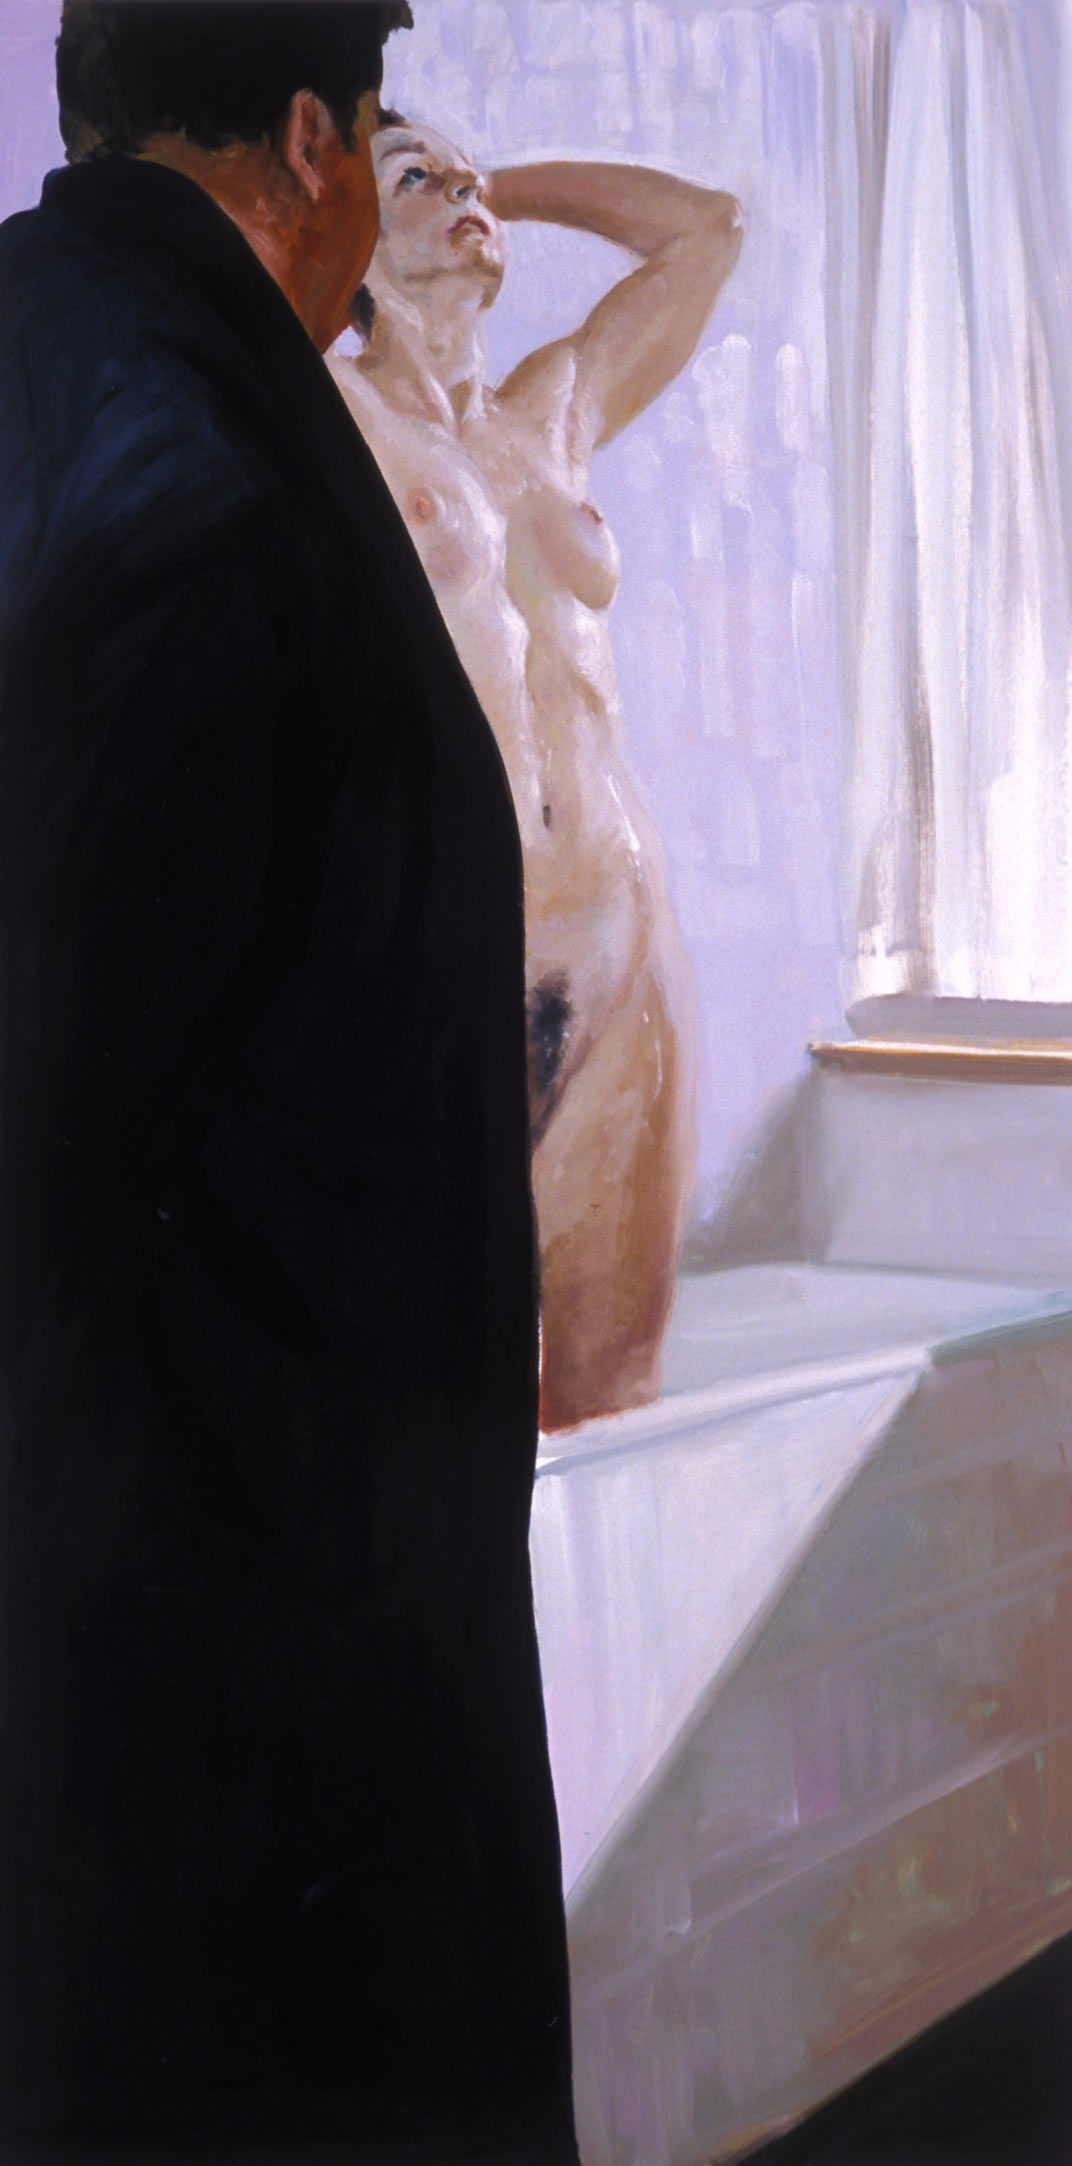 Bathroom, Scene  #5, 2005.